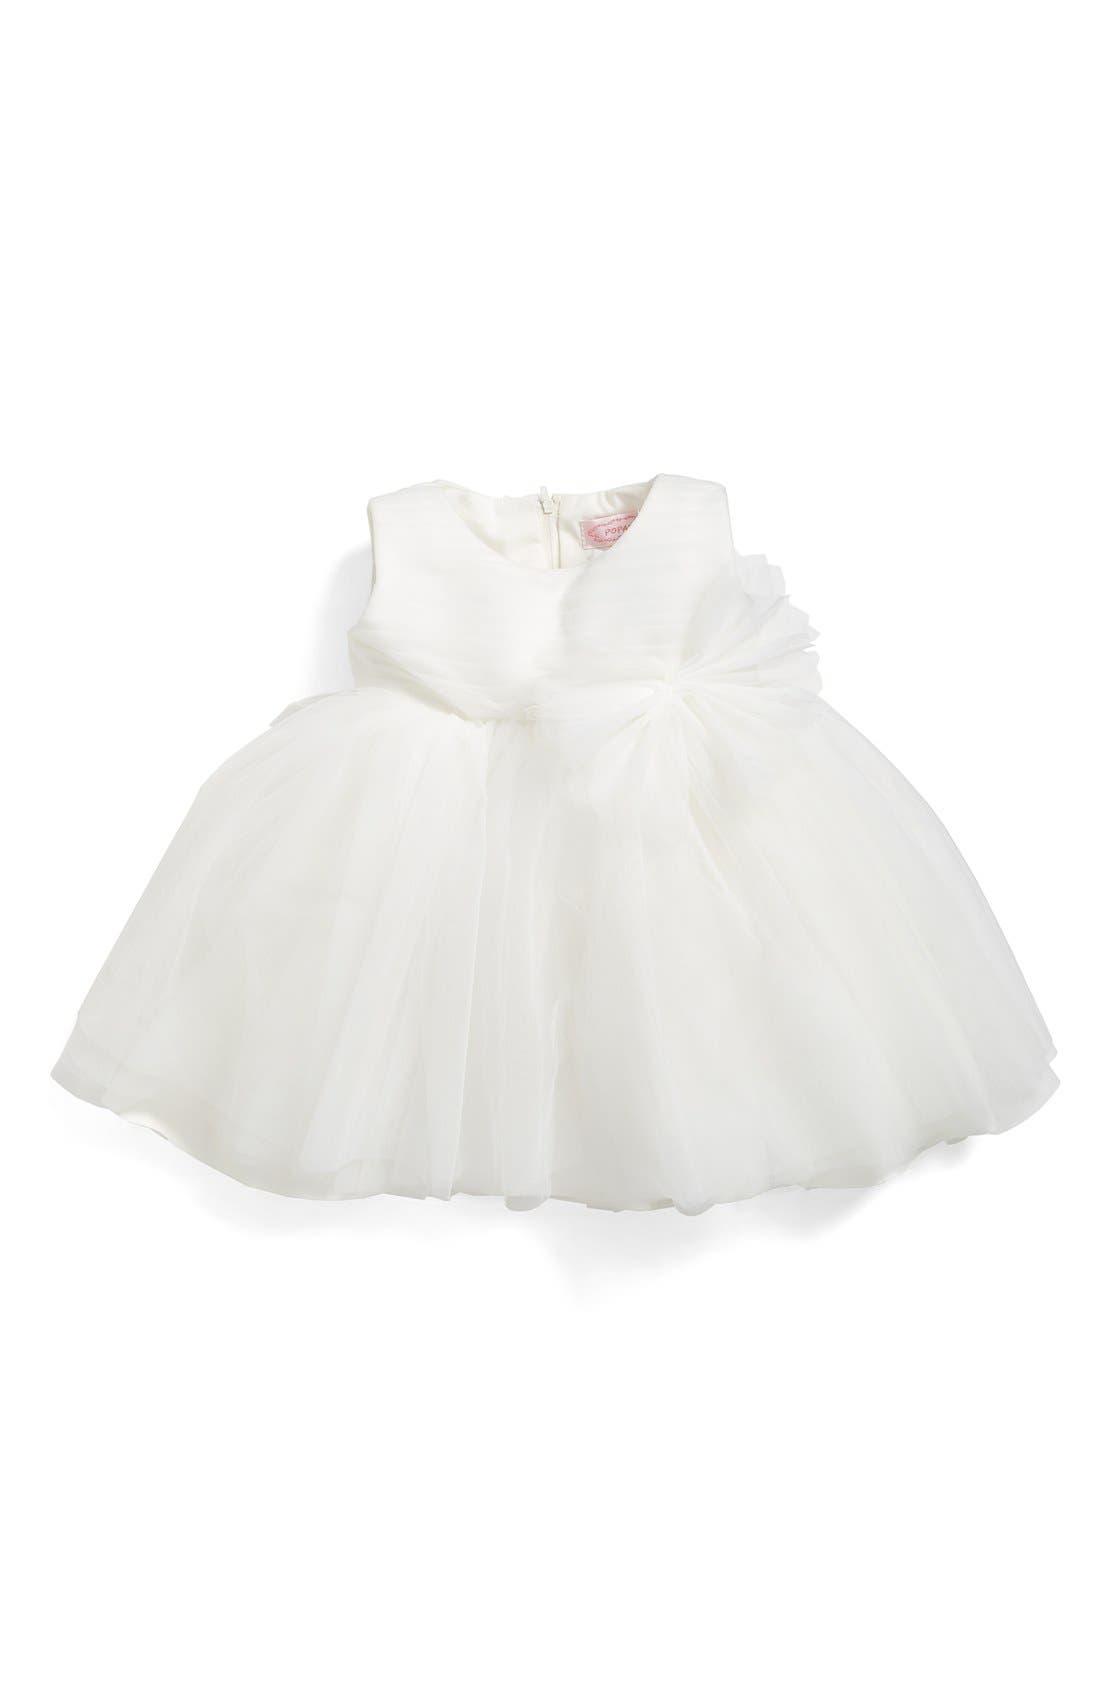 Main Image - Popatu Fit & Flare Tulle Dress (Baby Girls)